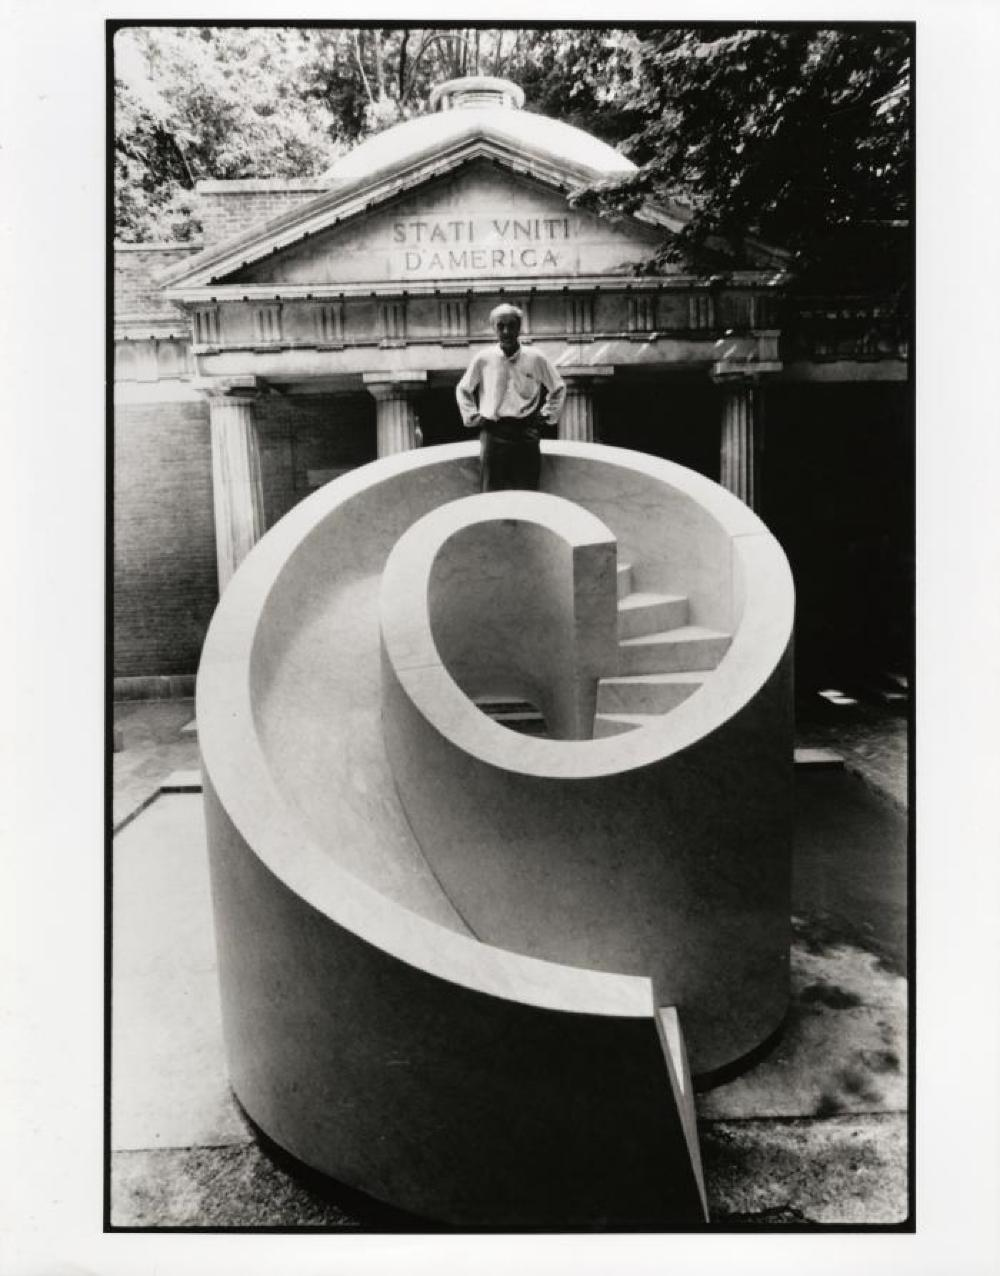 Isamu Noguchi in Venice, standing on top of Slide Mantra